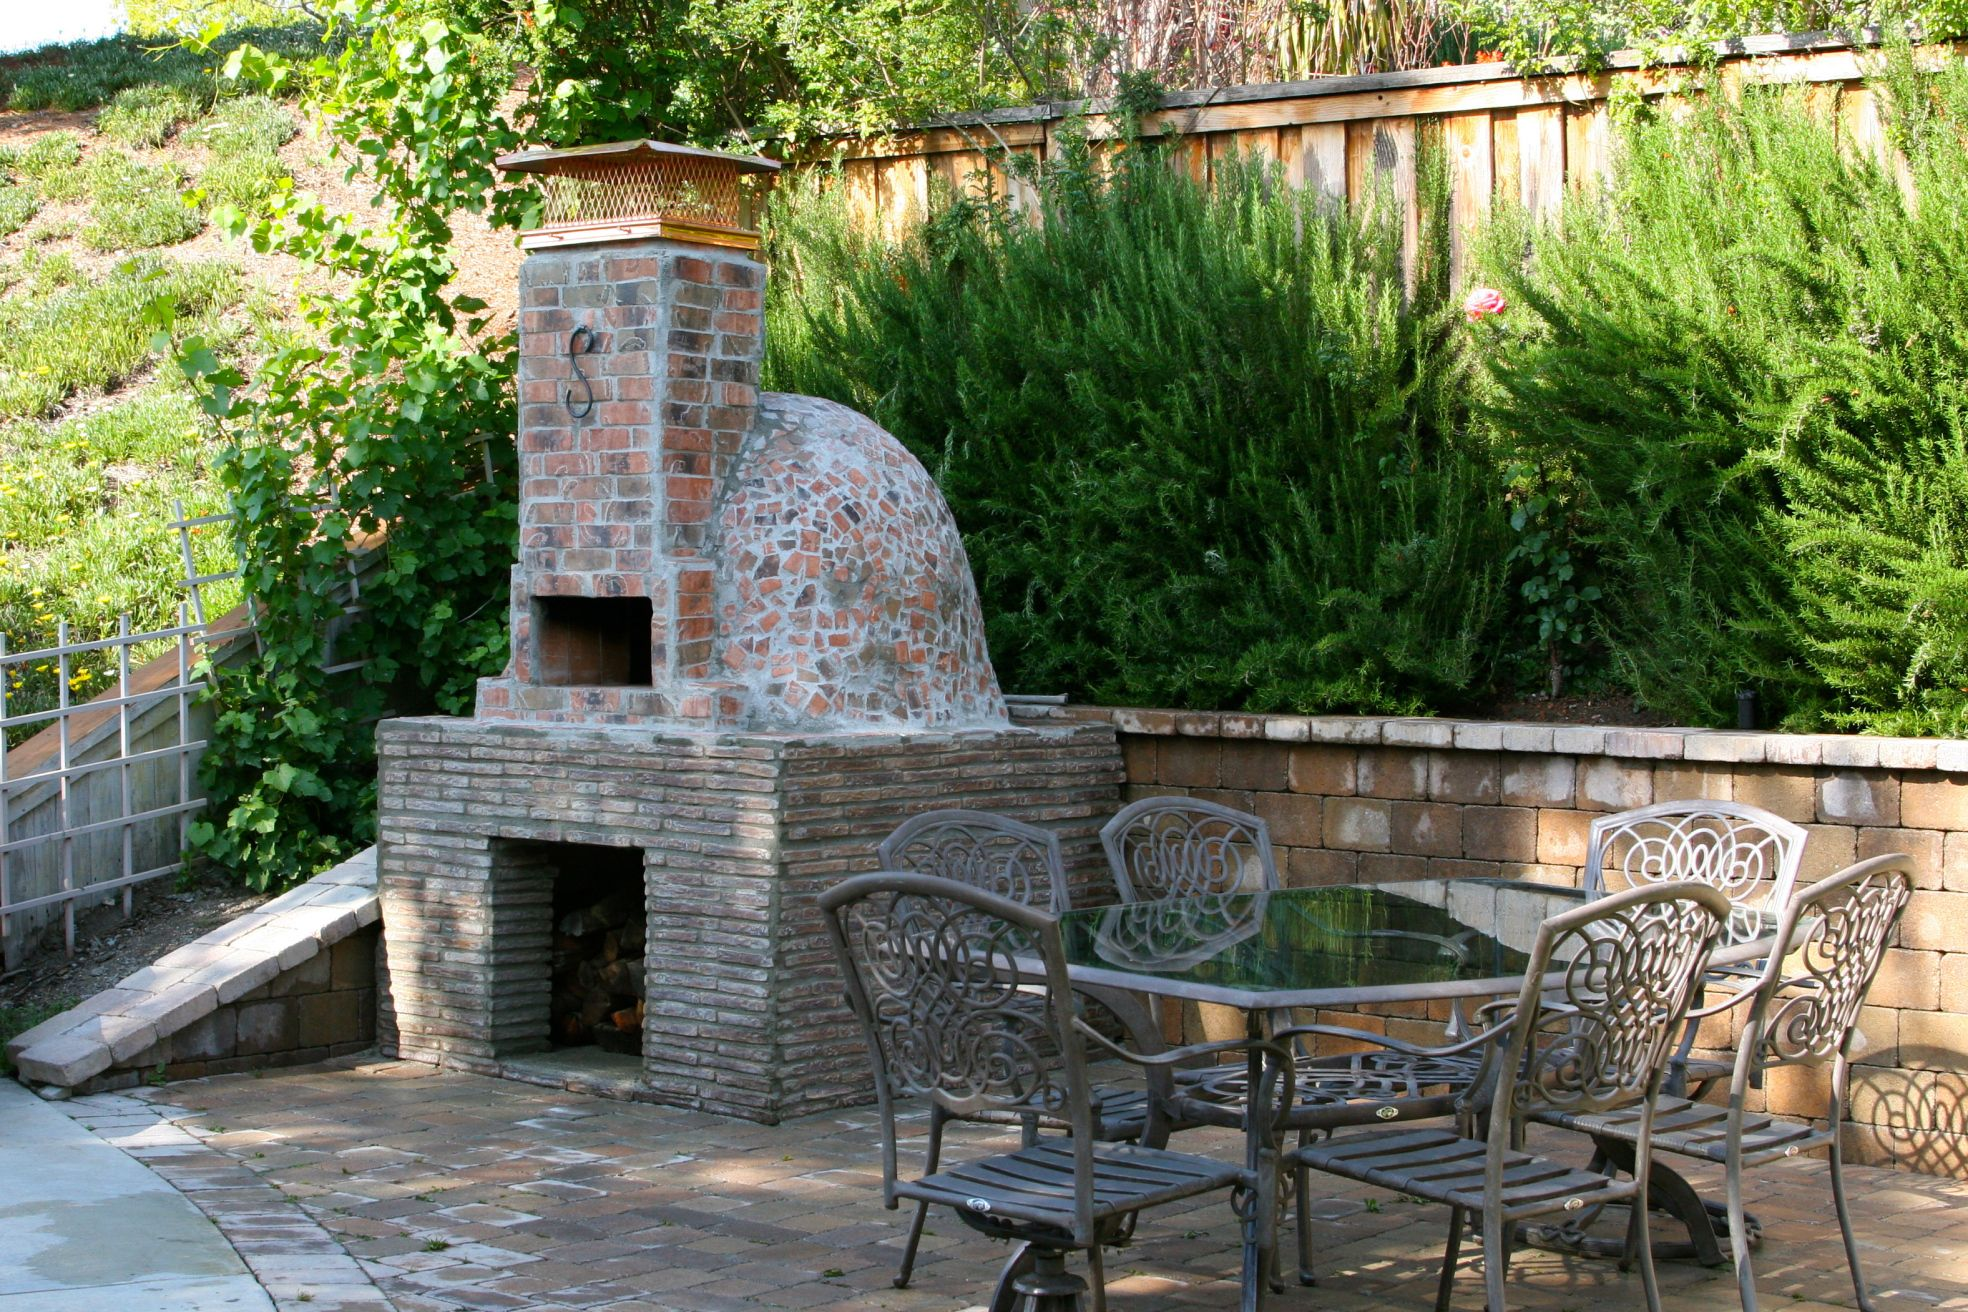 Build diy wood burning pizza oven diy pdf wood project